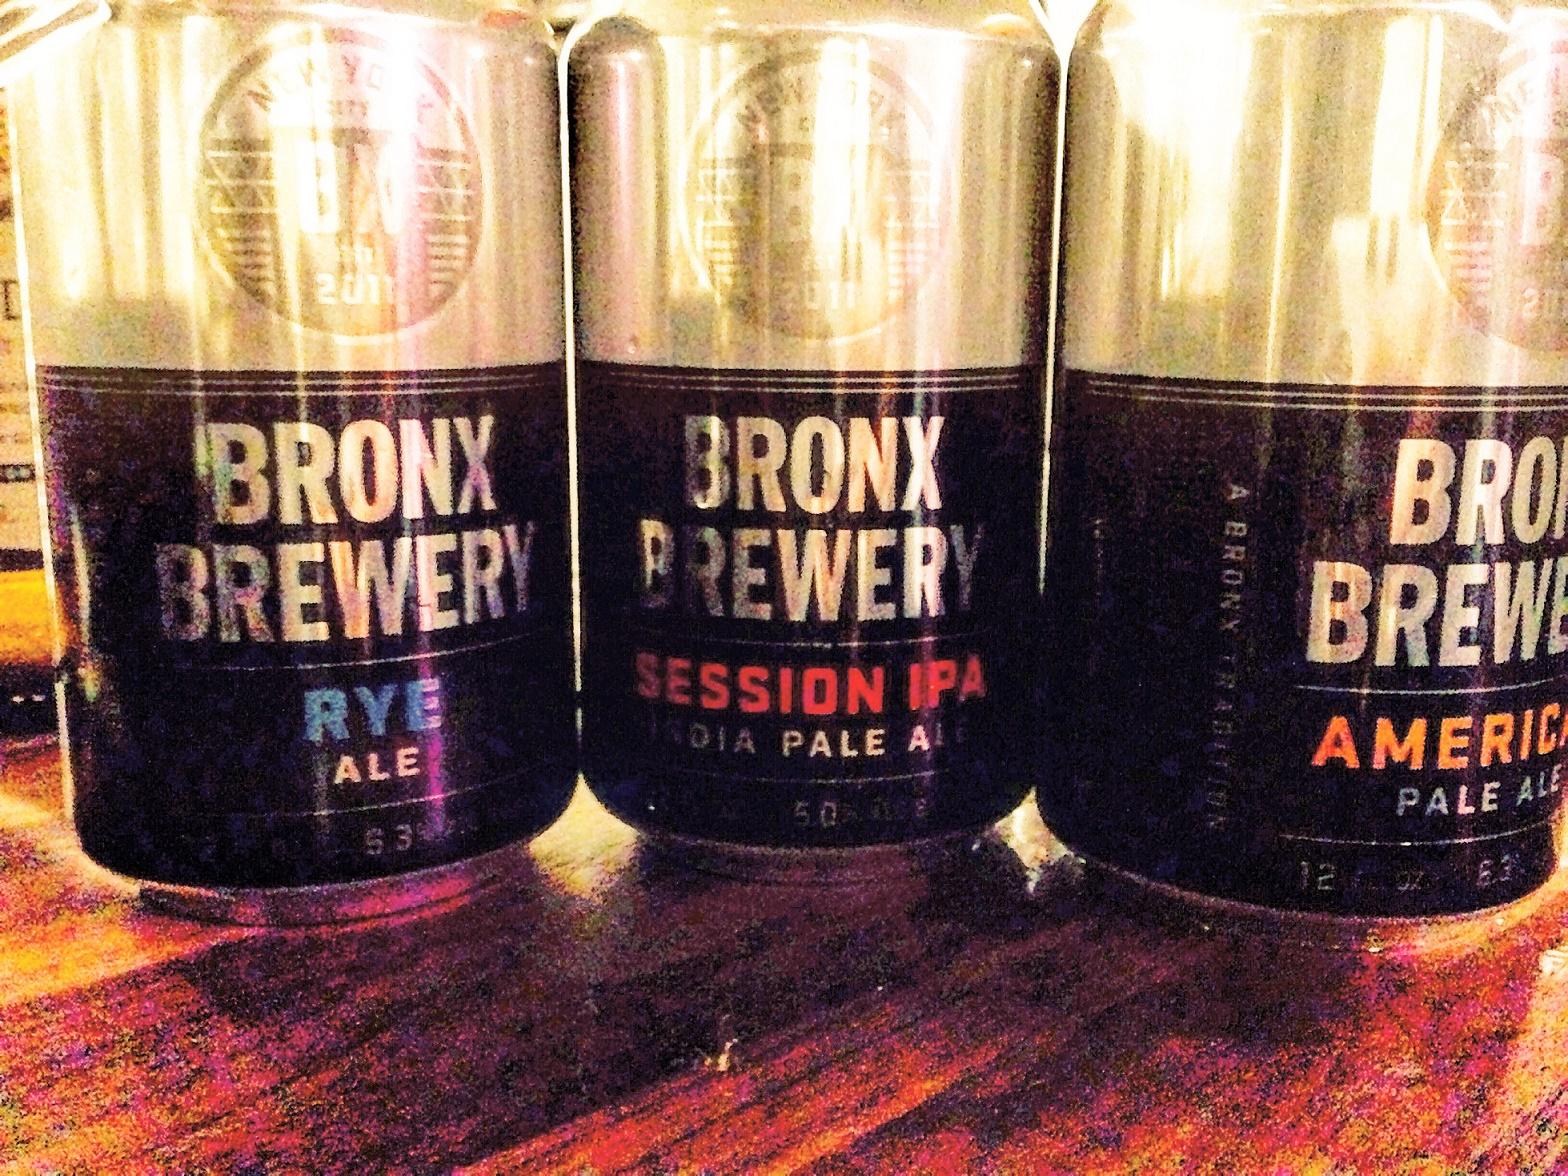 Bronx Brewery at wework.jpg